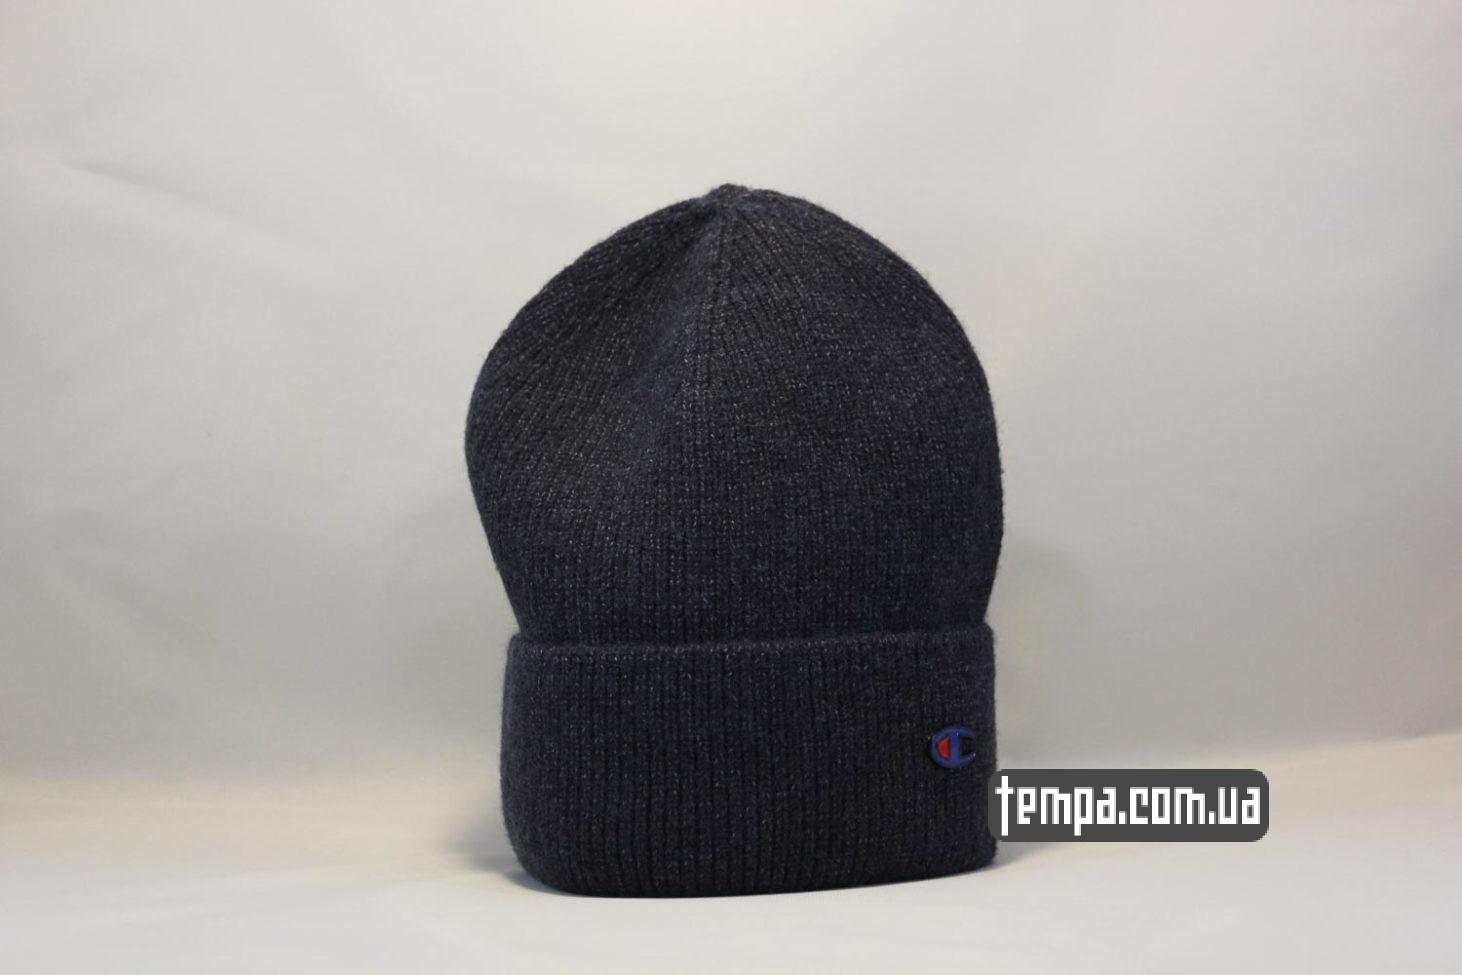 шапка beanie Champion black черная купить Украина